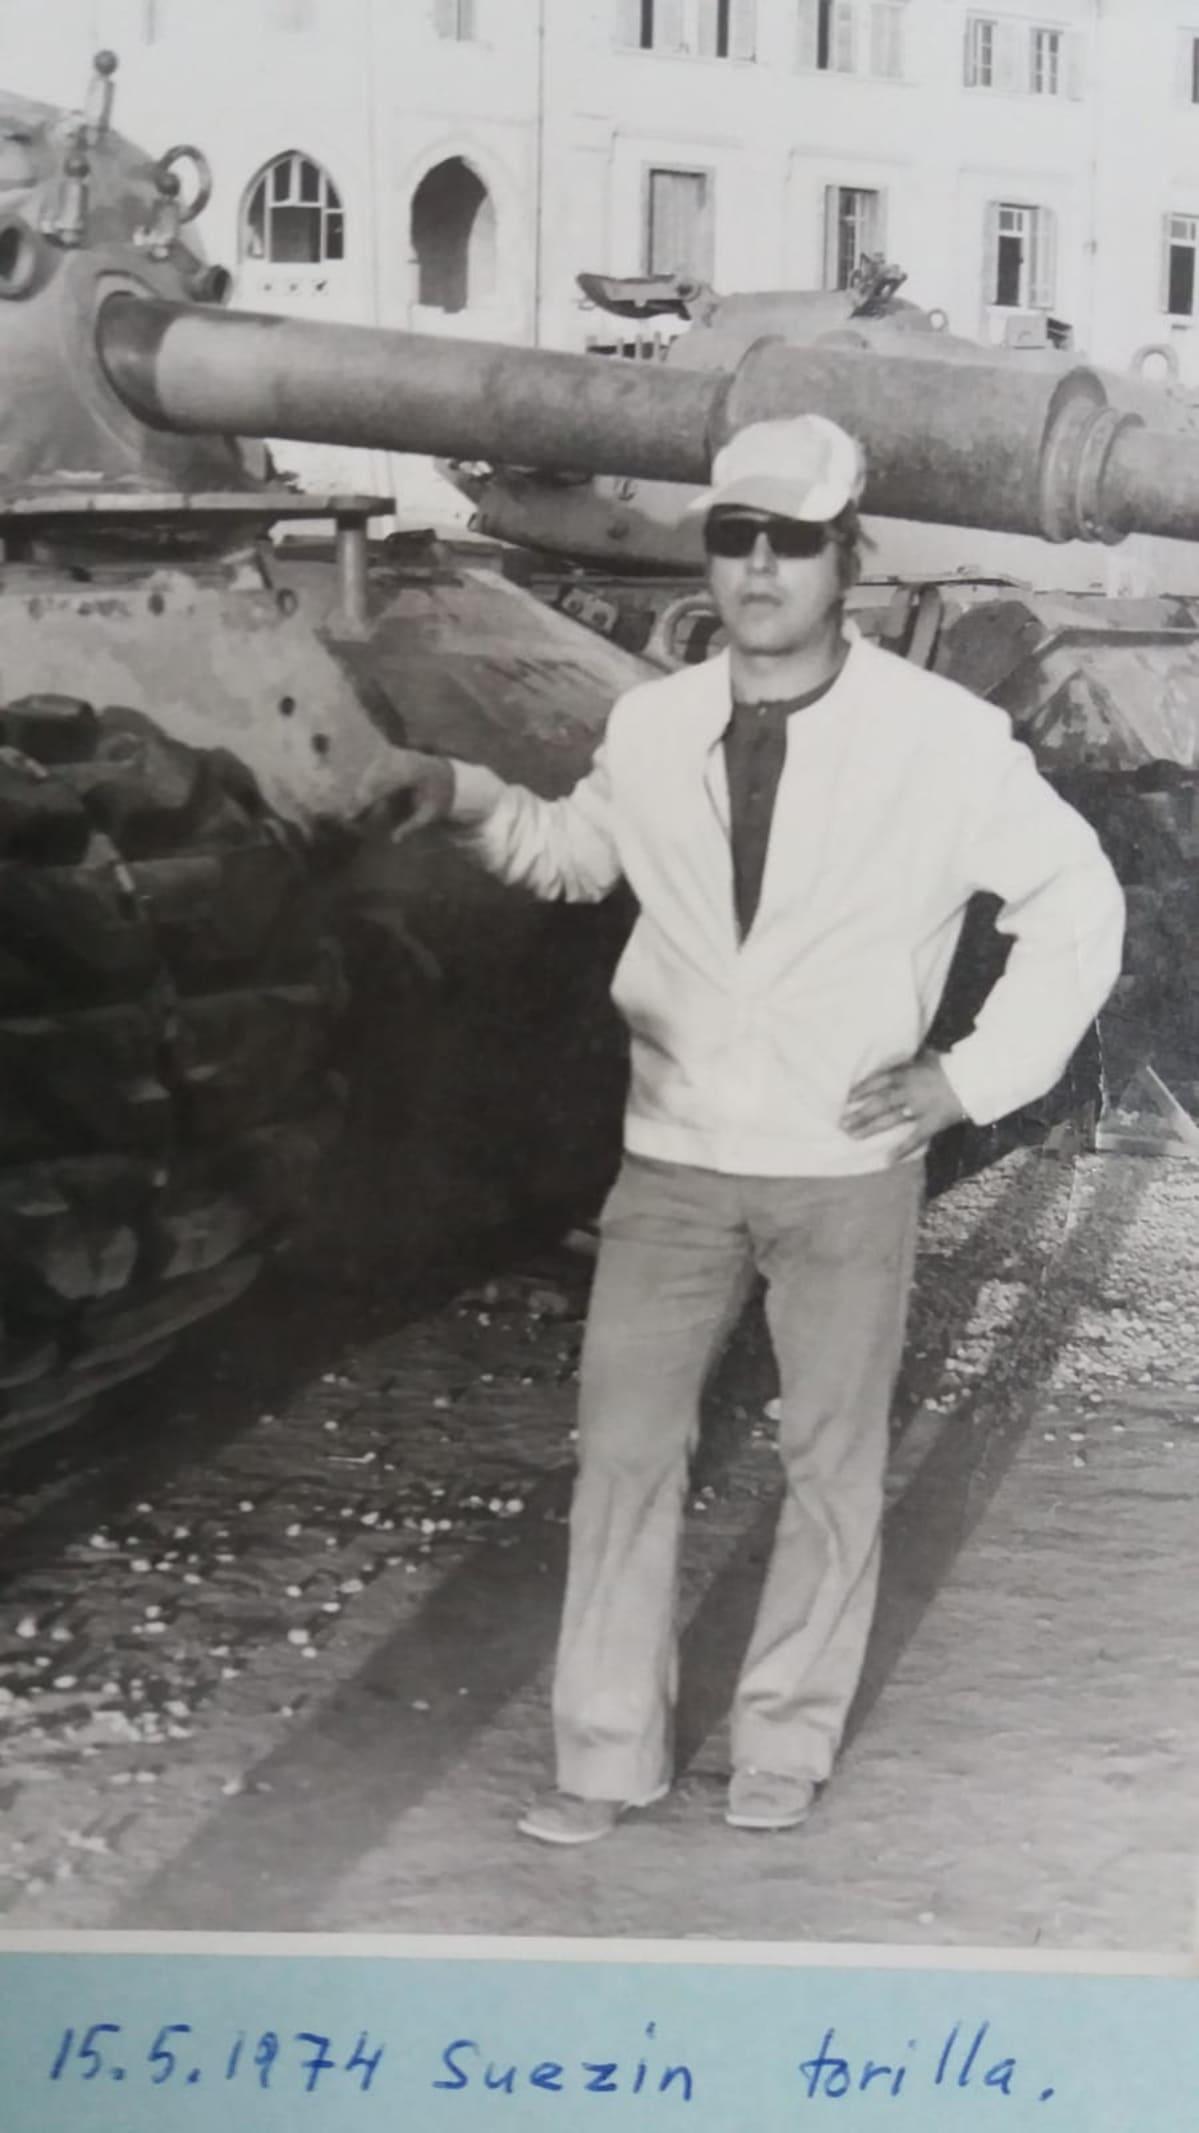 Arvi Lind Suezin torilla 1974